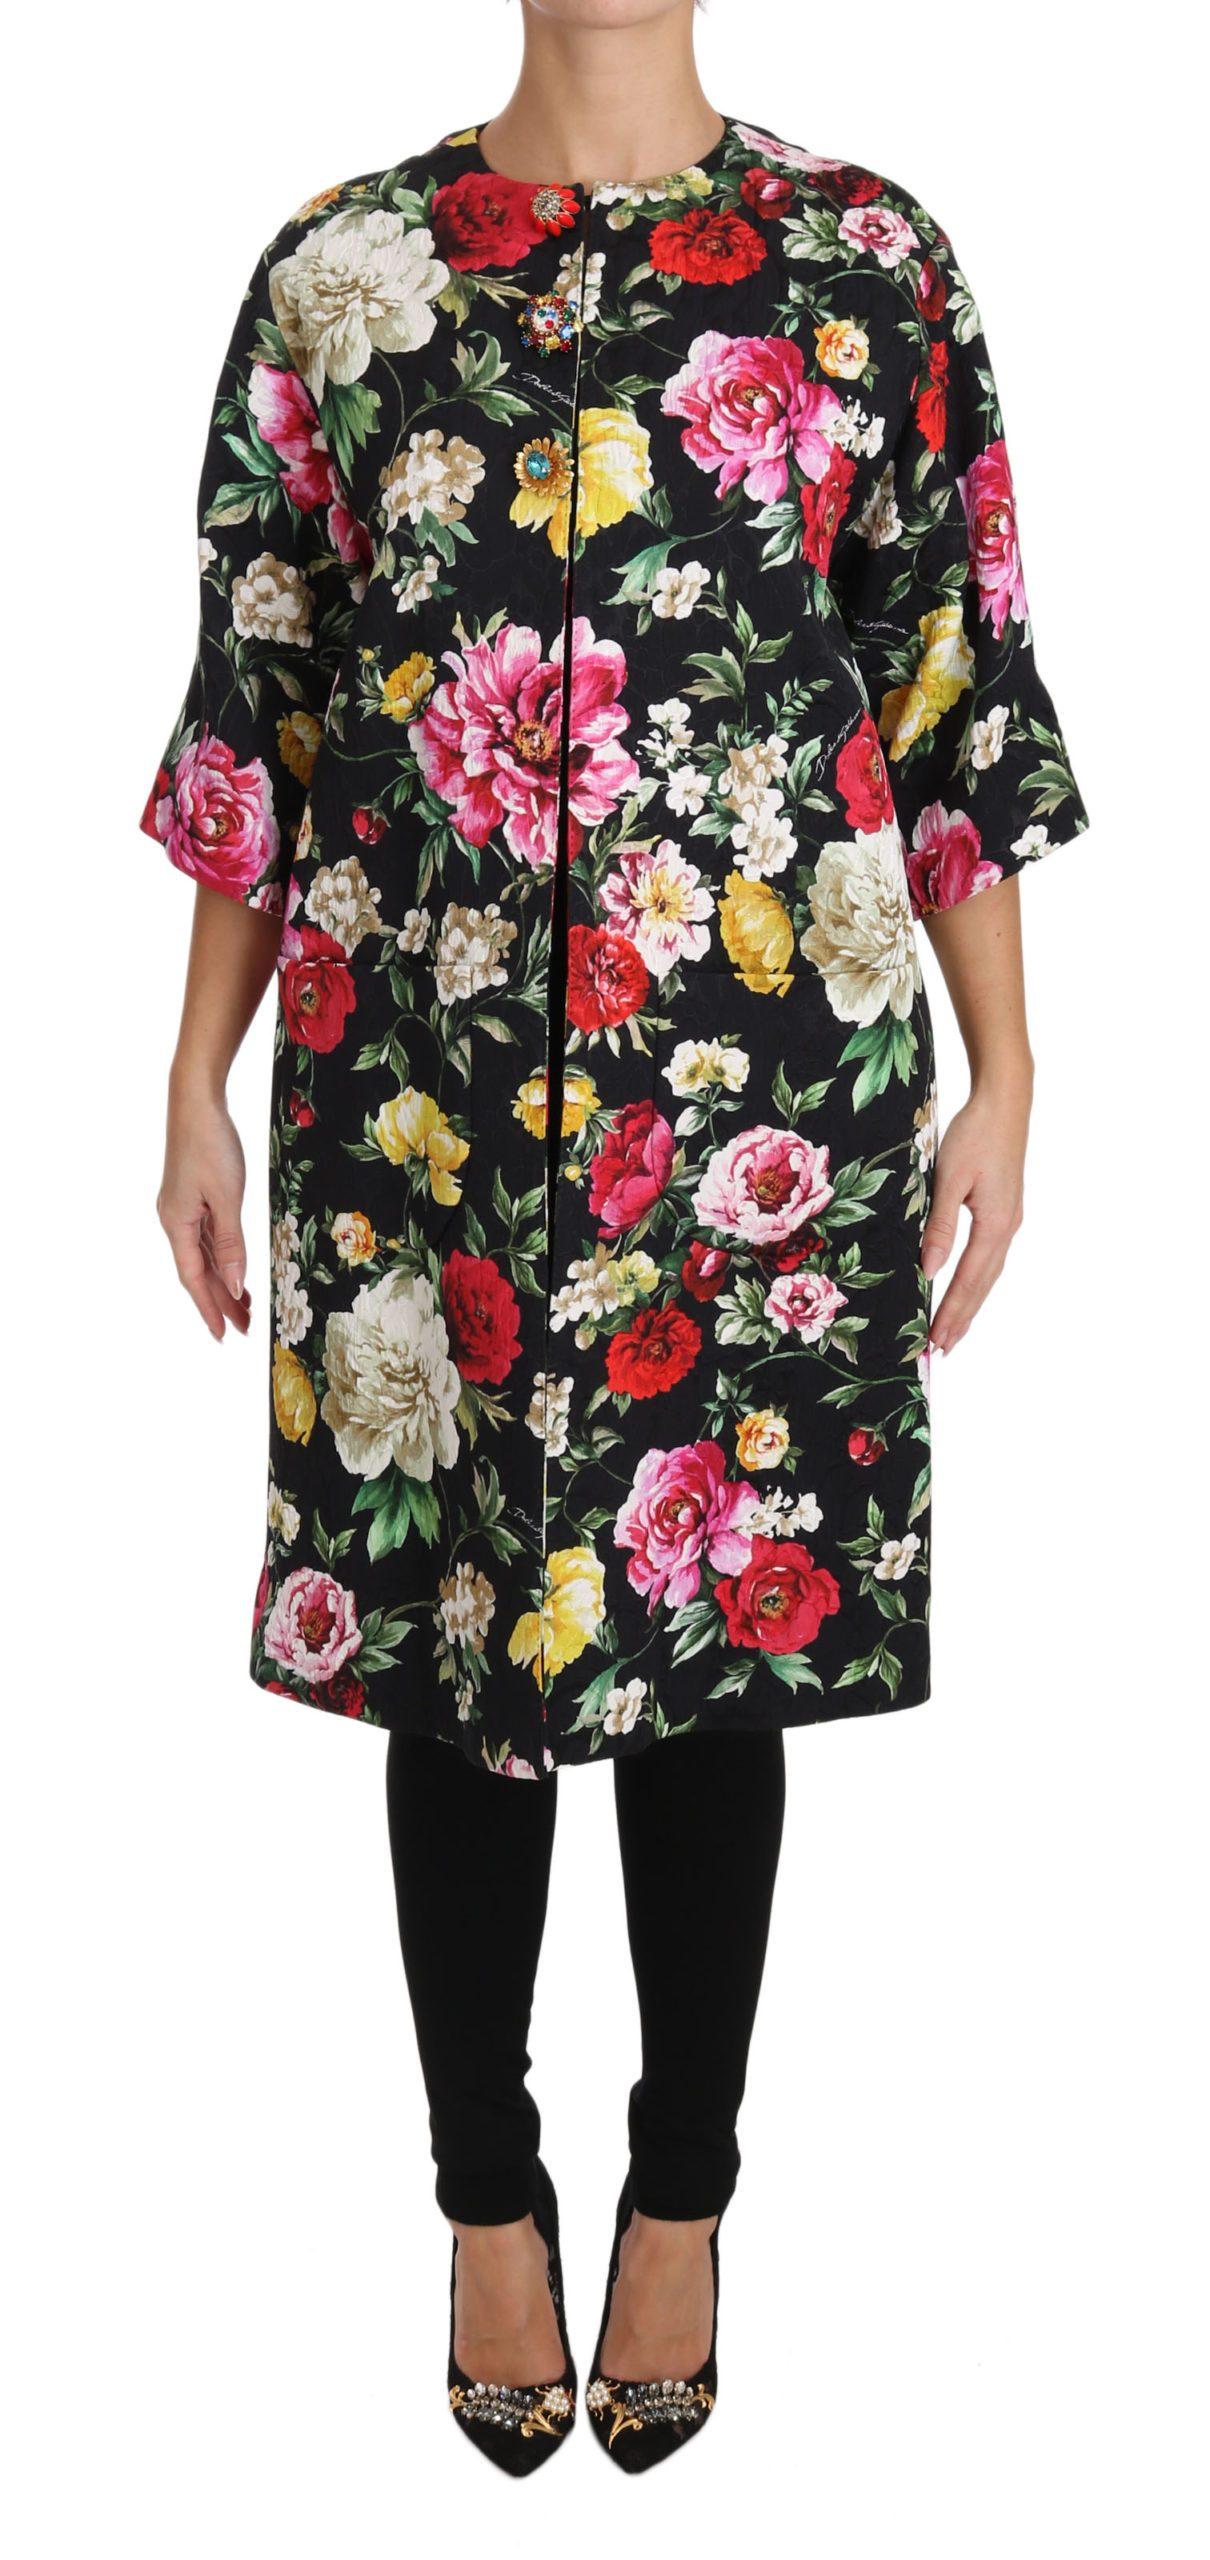 Dolce & Gabbana Women's Floral Crystal Jacquard Coat Black JKT2316 - IT36   XS